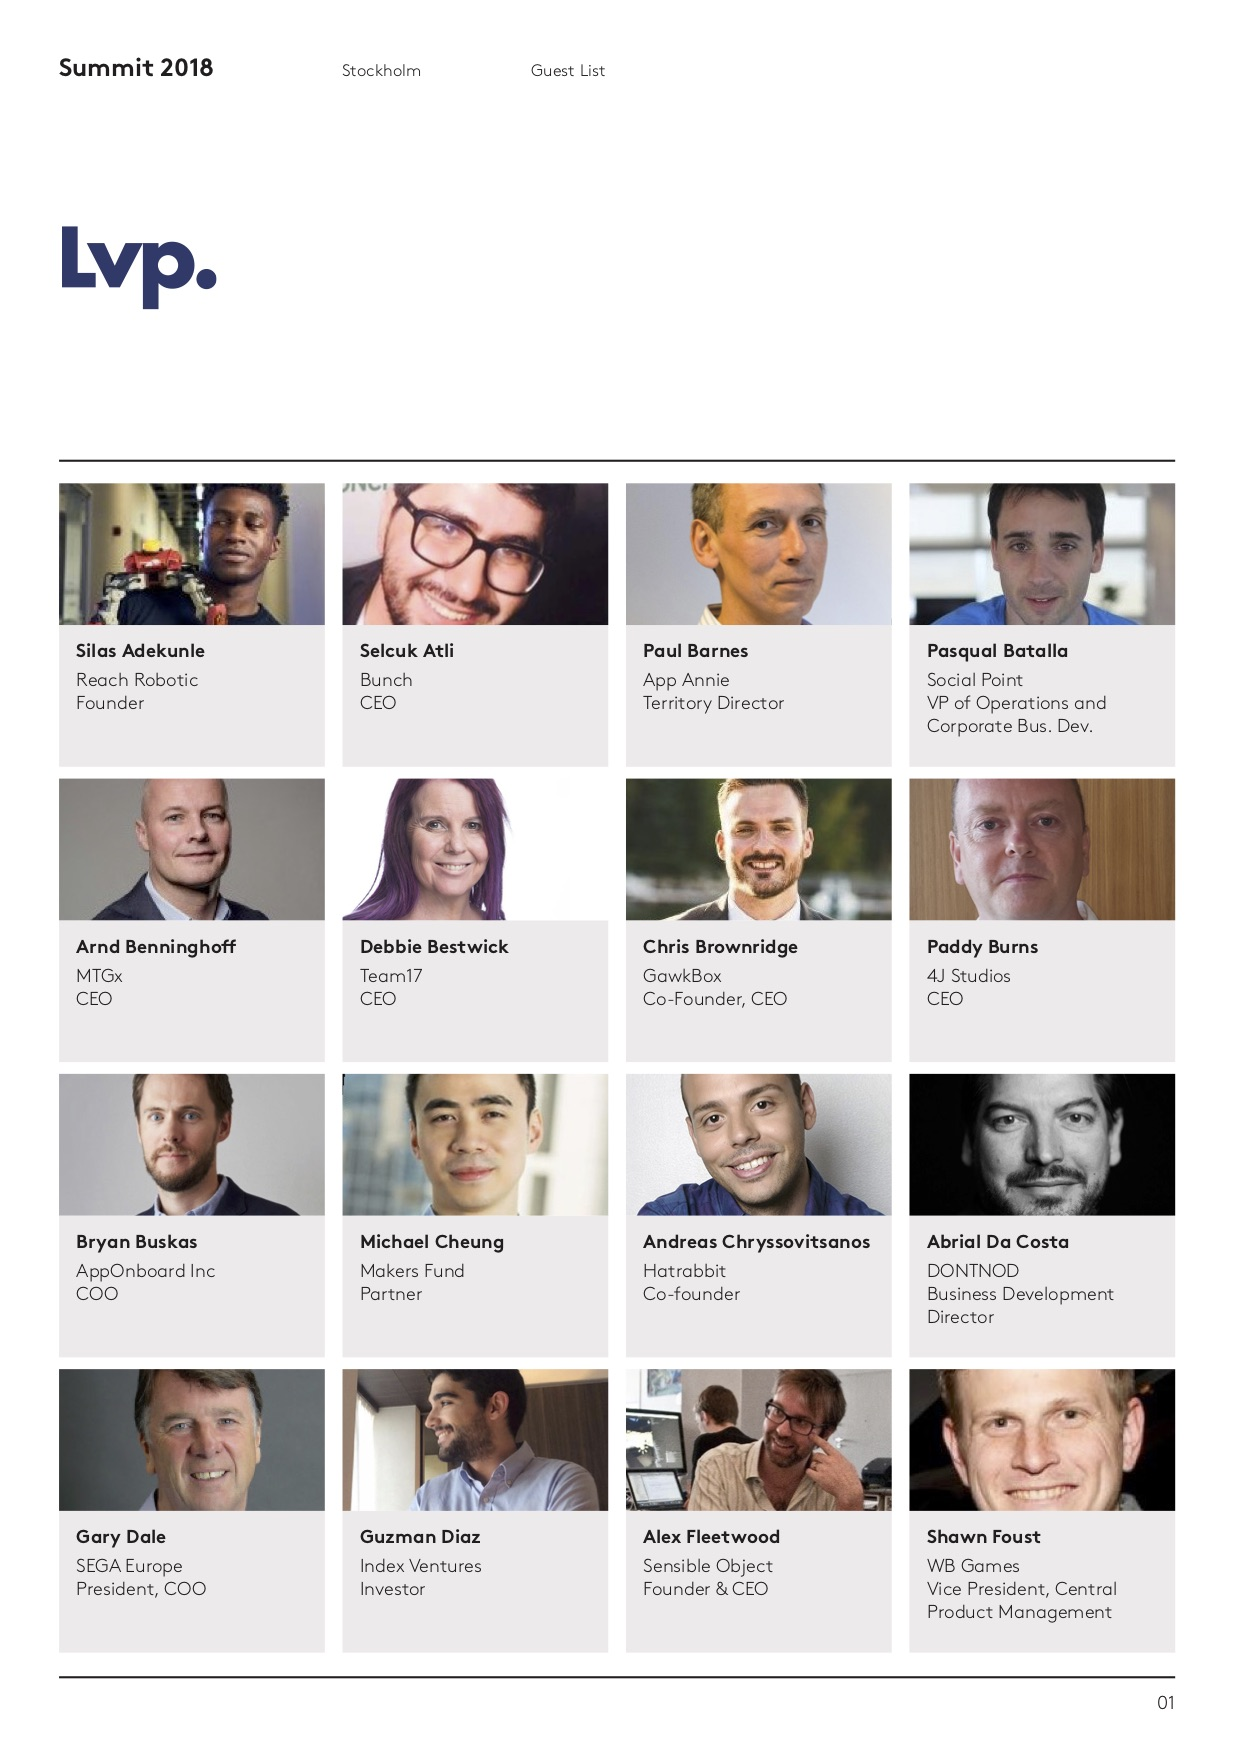 LVP_Summit2018_Guest List.jpg